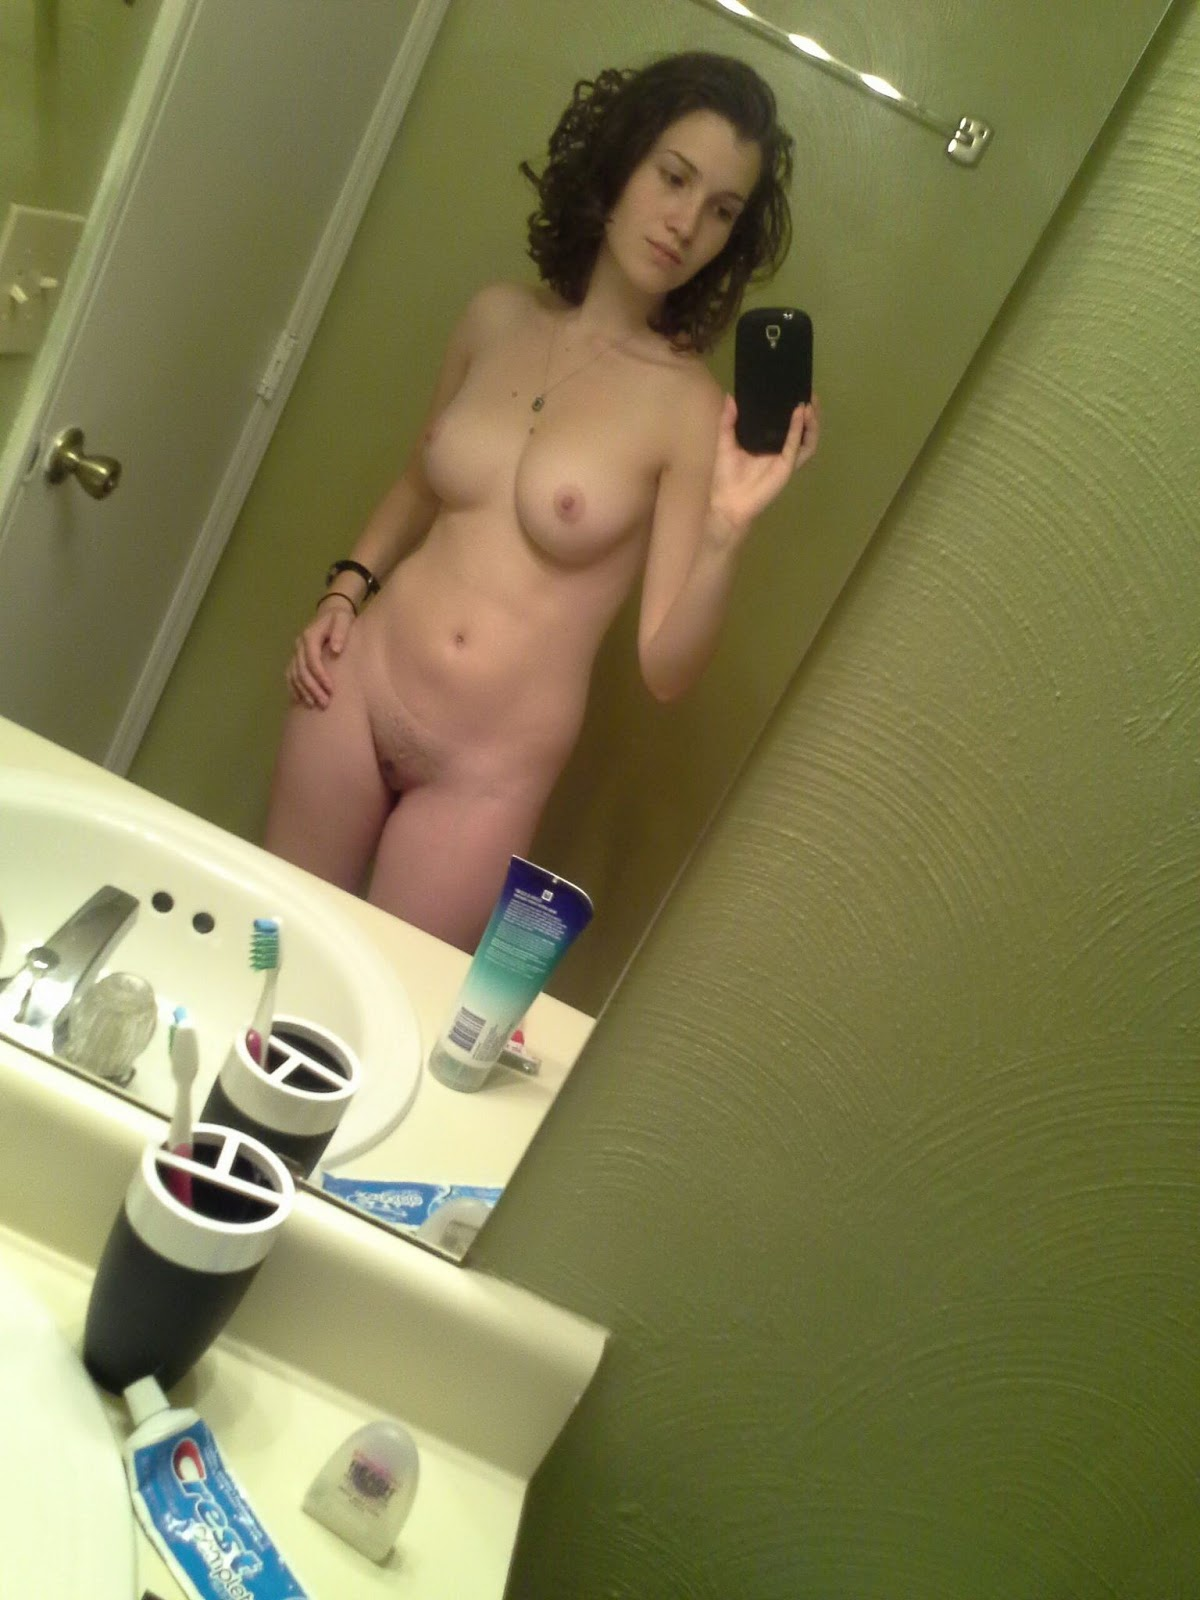 лицо девушка дома снимает себя на камеру независимо пола, часто